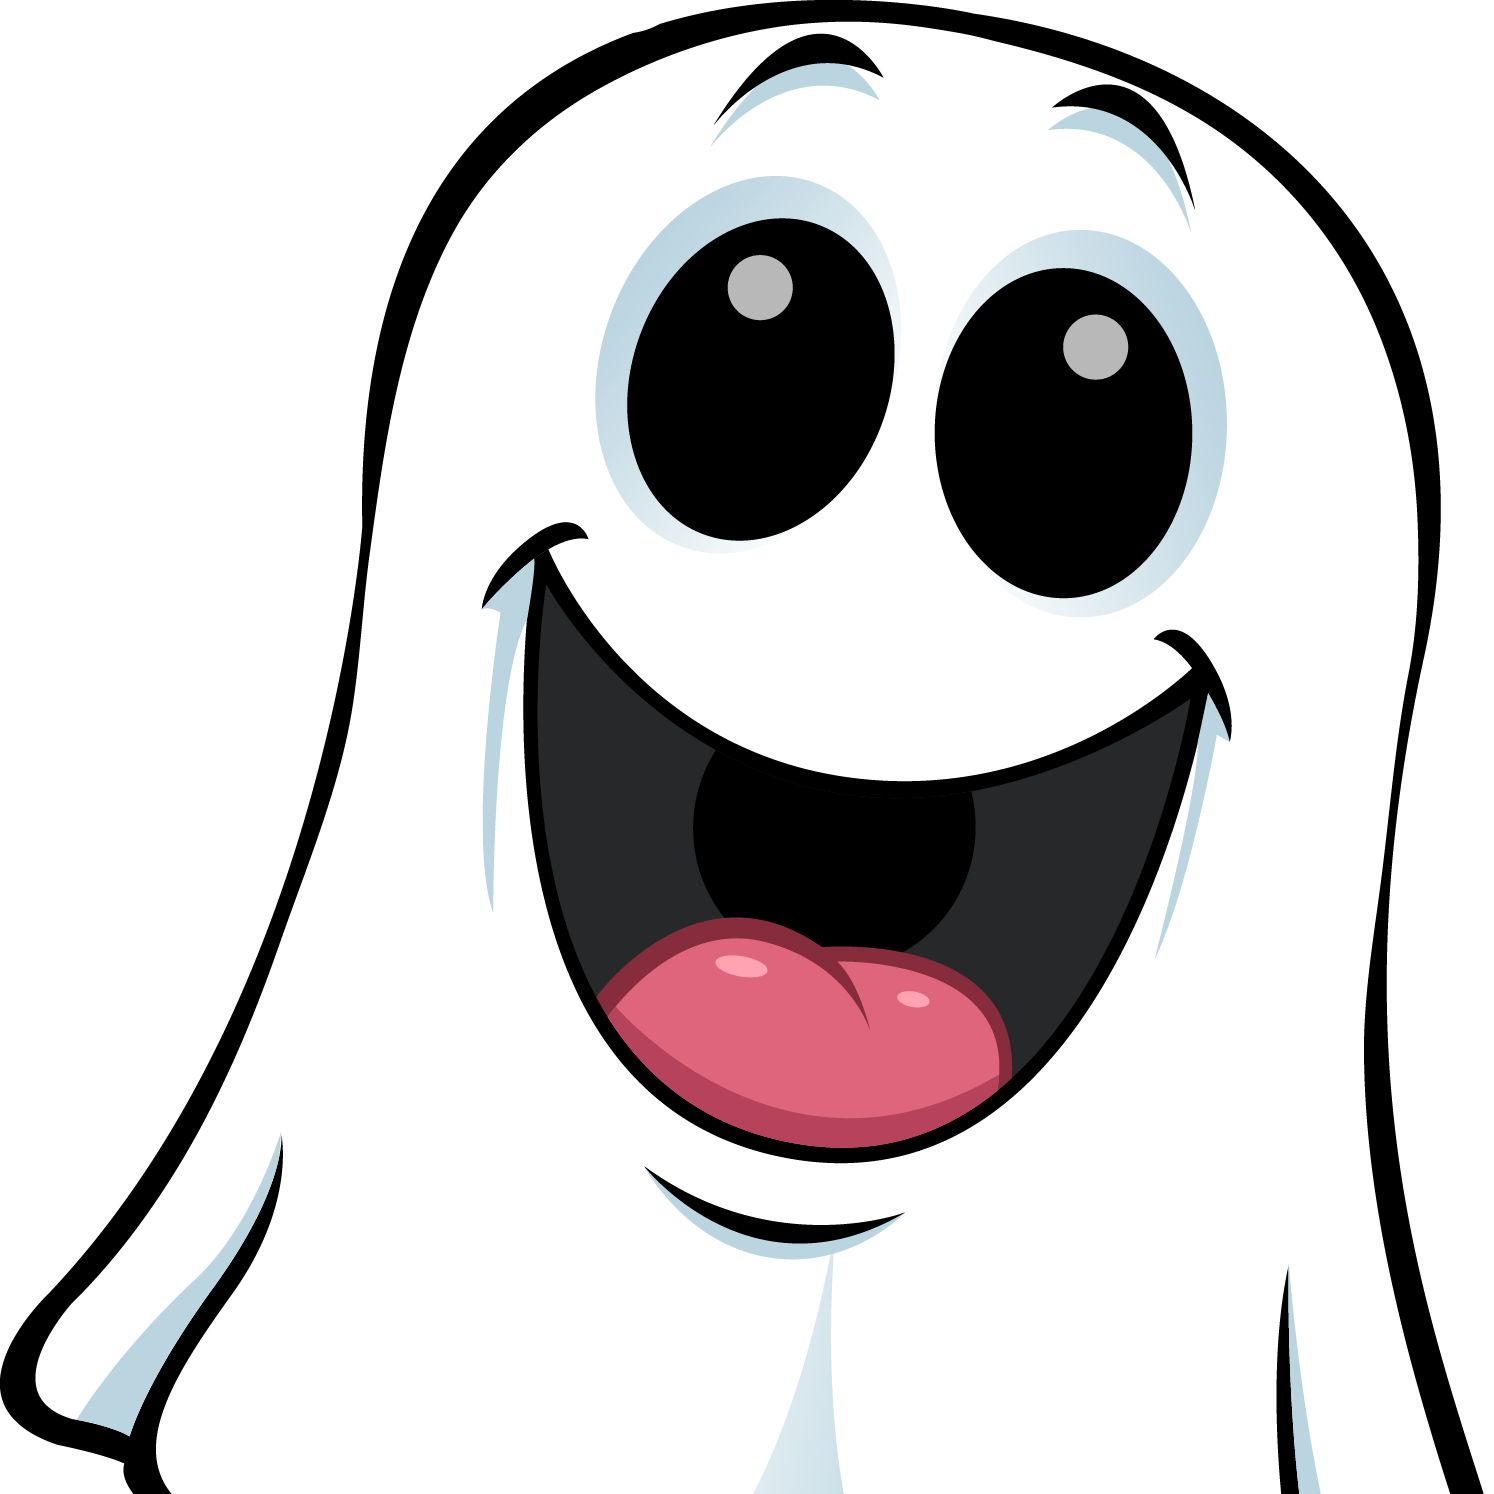 GhostCast